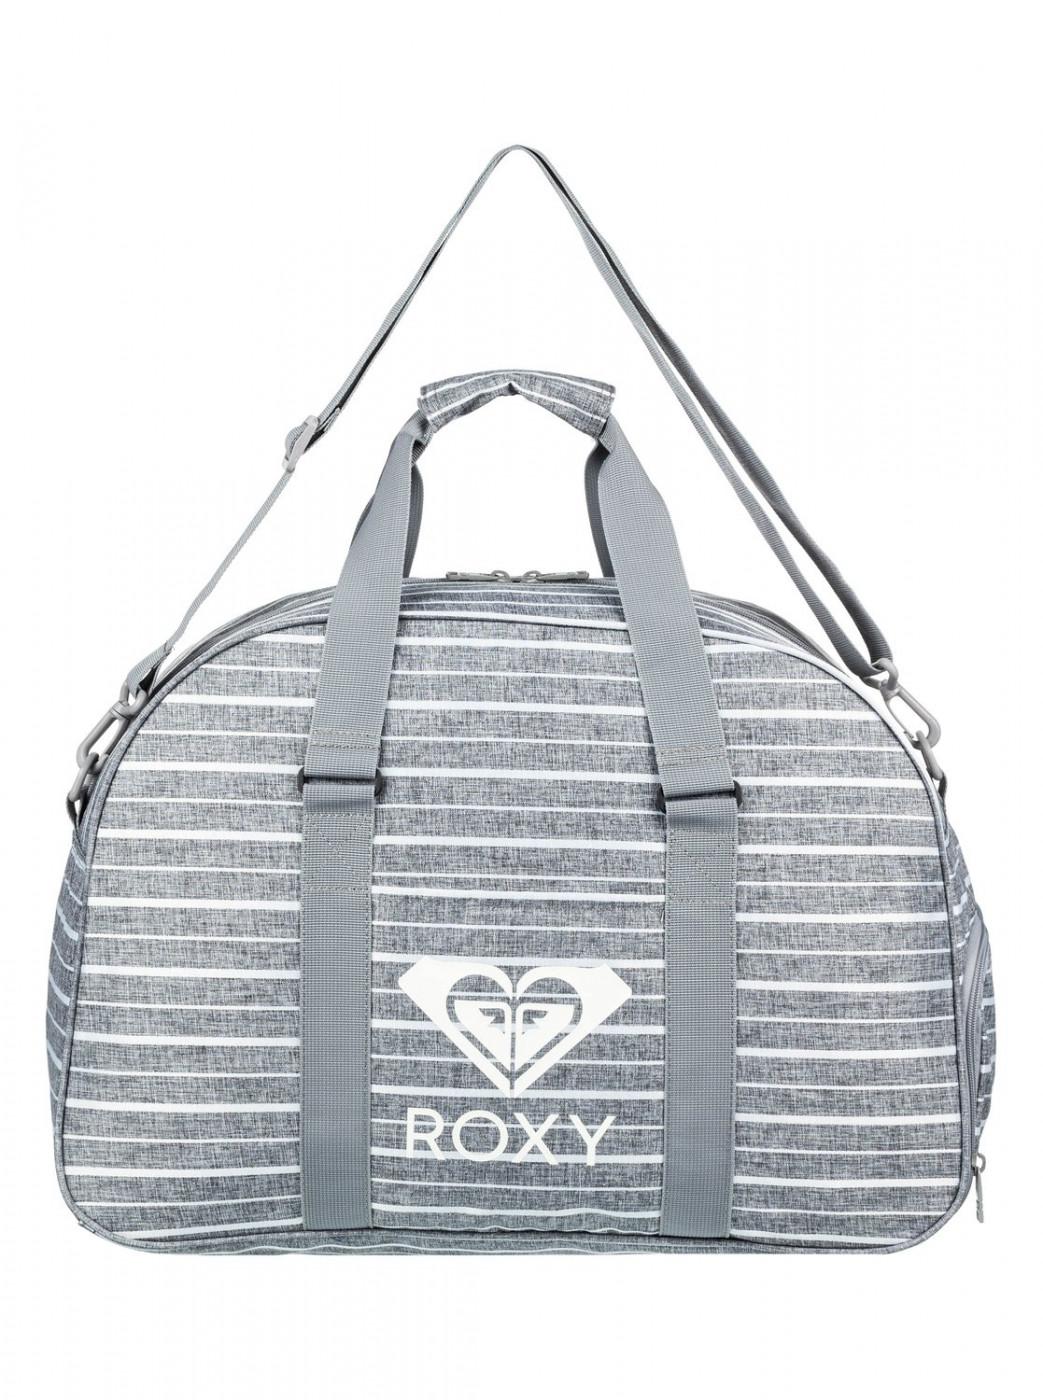 c09dab1d8 Bag ROXY FEEL HAPPY HEATHER - FACTCOOL